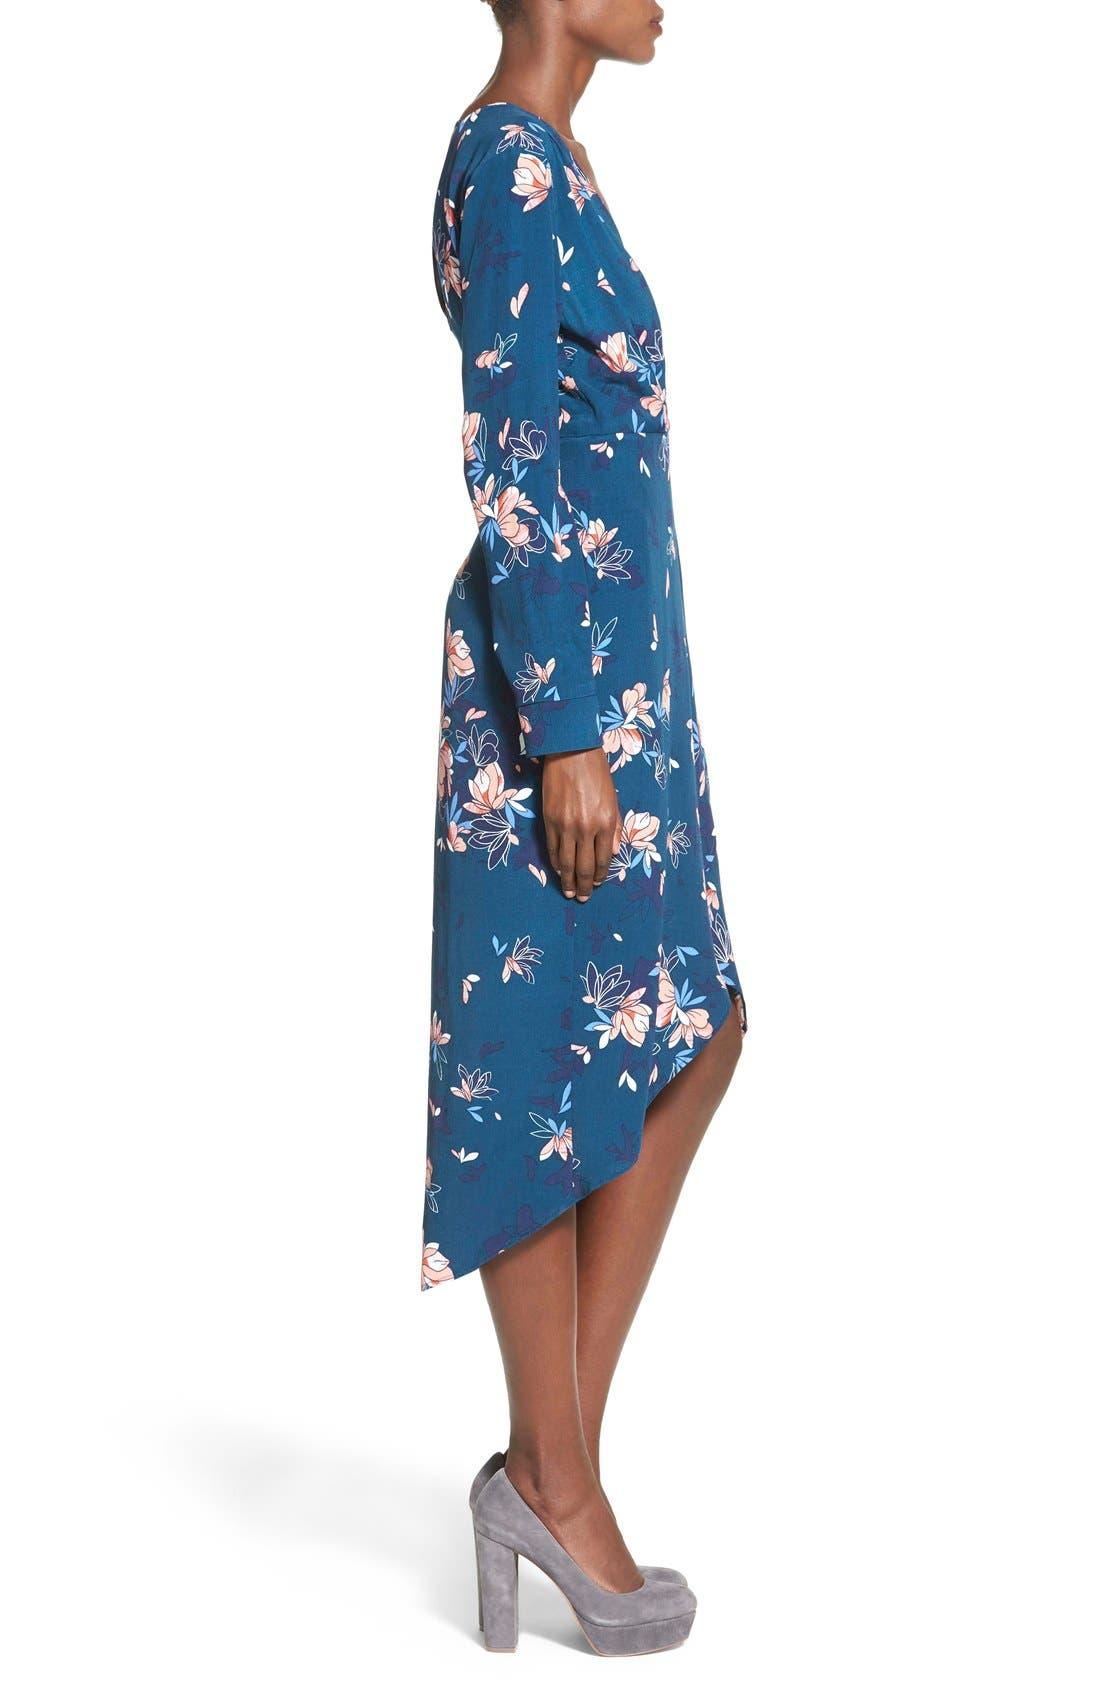 ASTR Wrap Front High/Low Dress,                             Alternate thumbnail 3, color,                             Teal Multi Floral